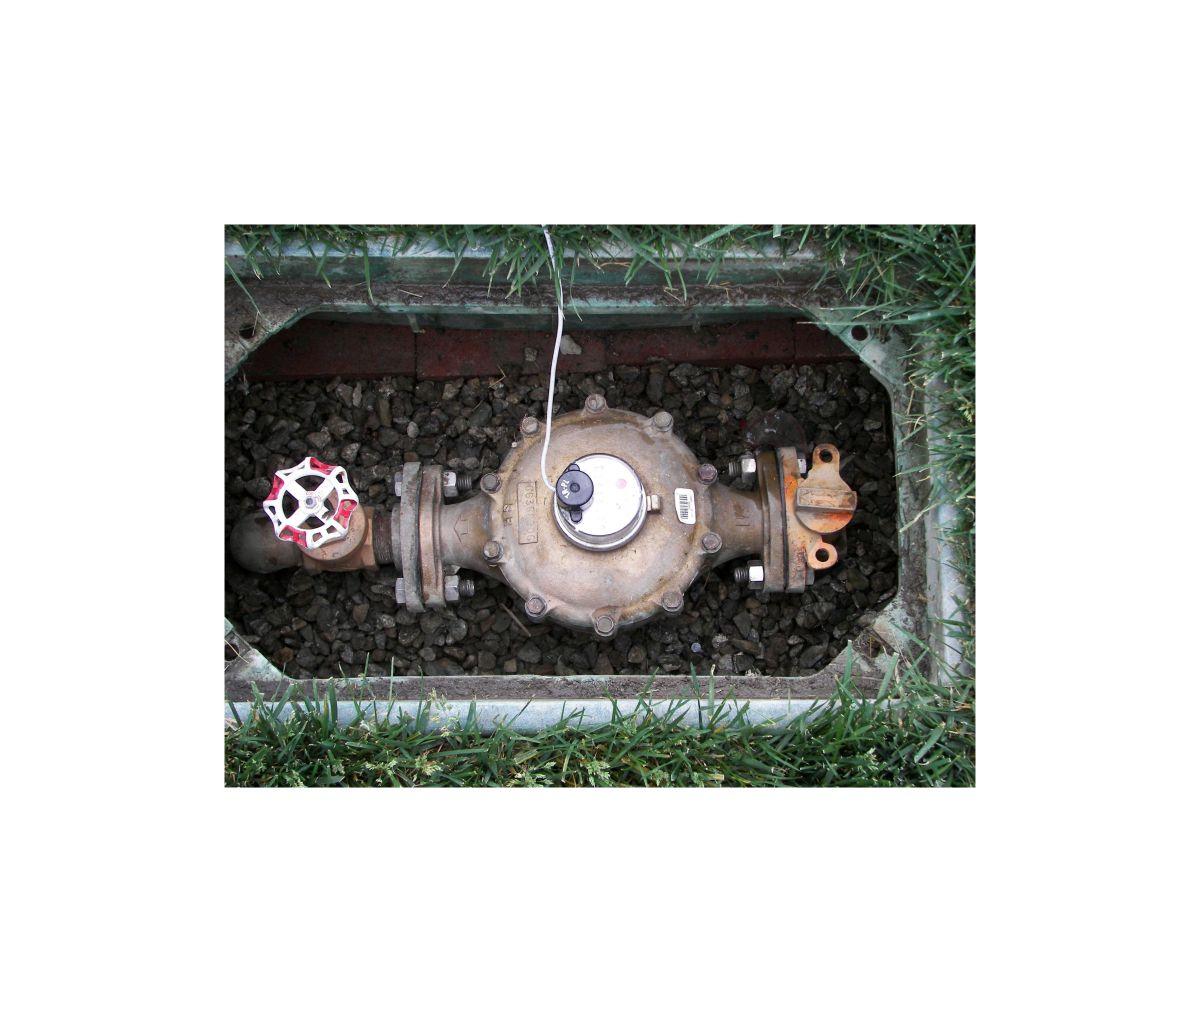 Water Meter Pits